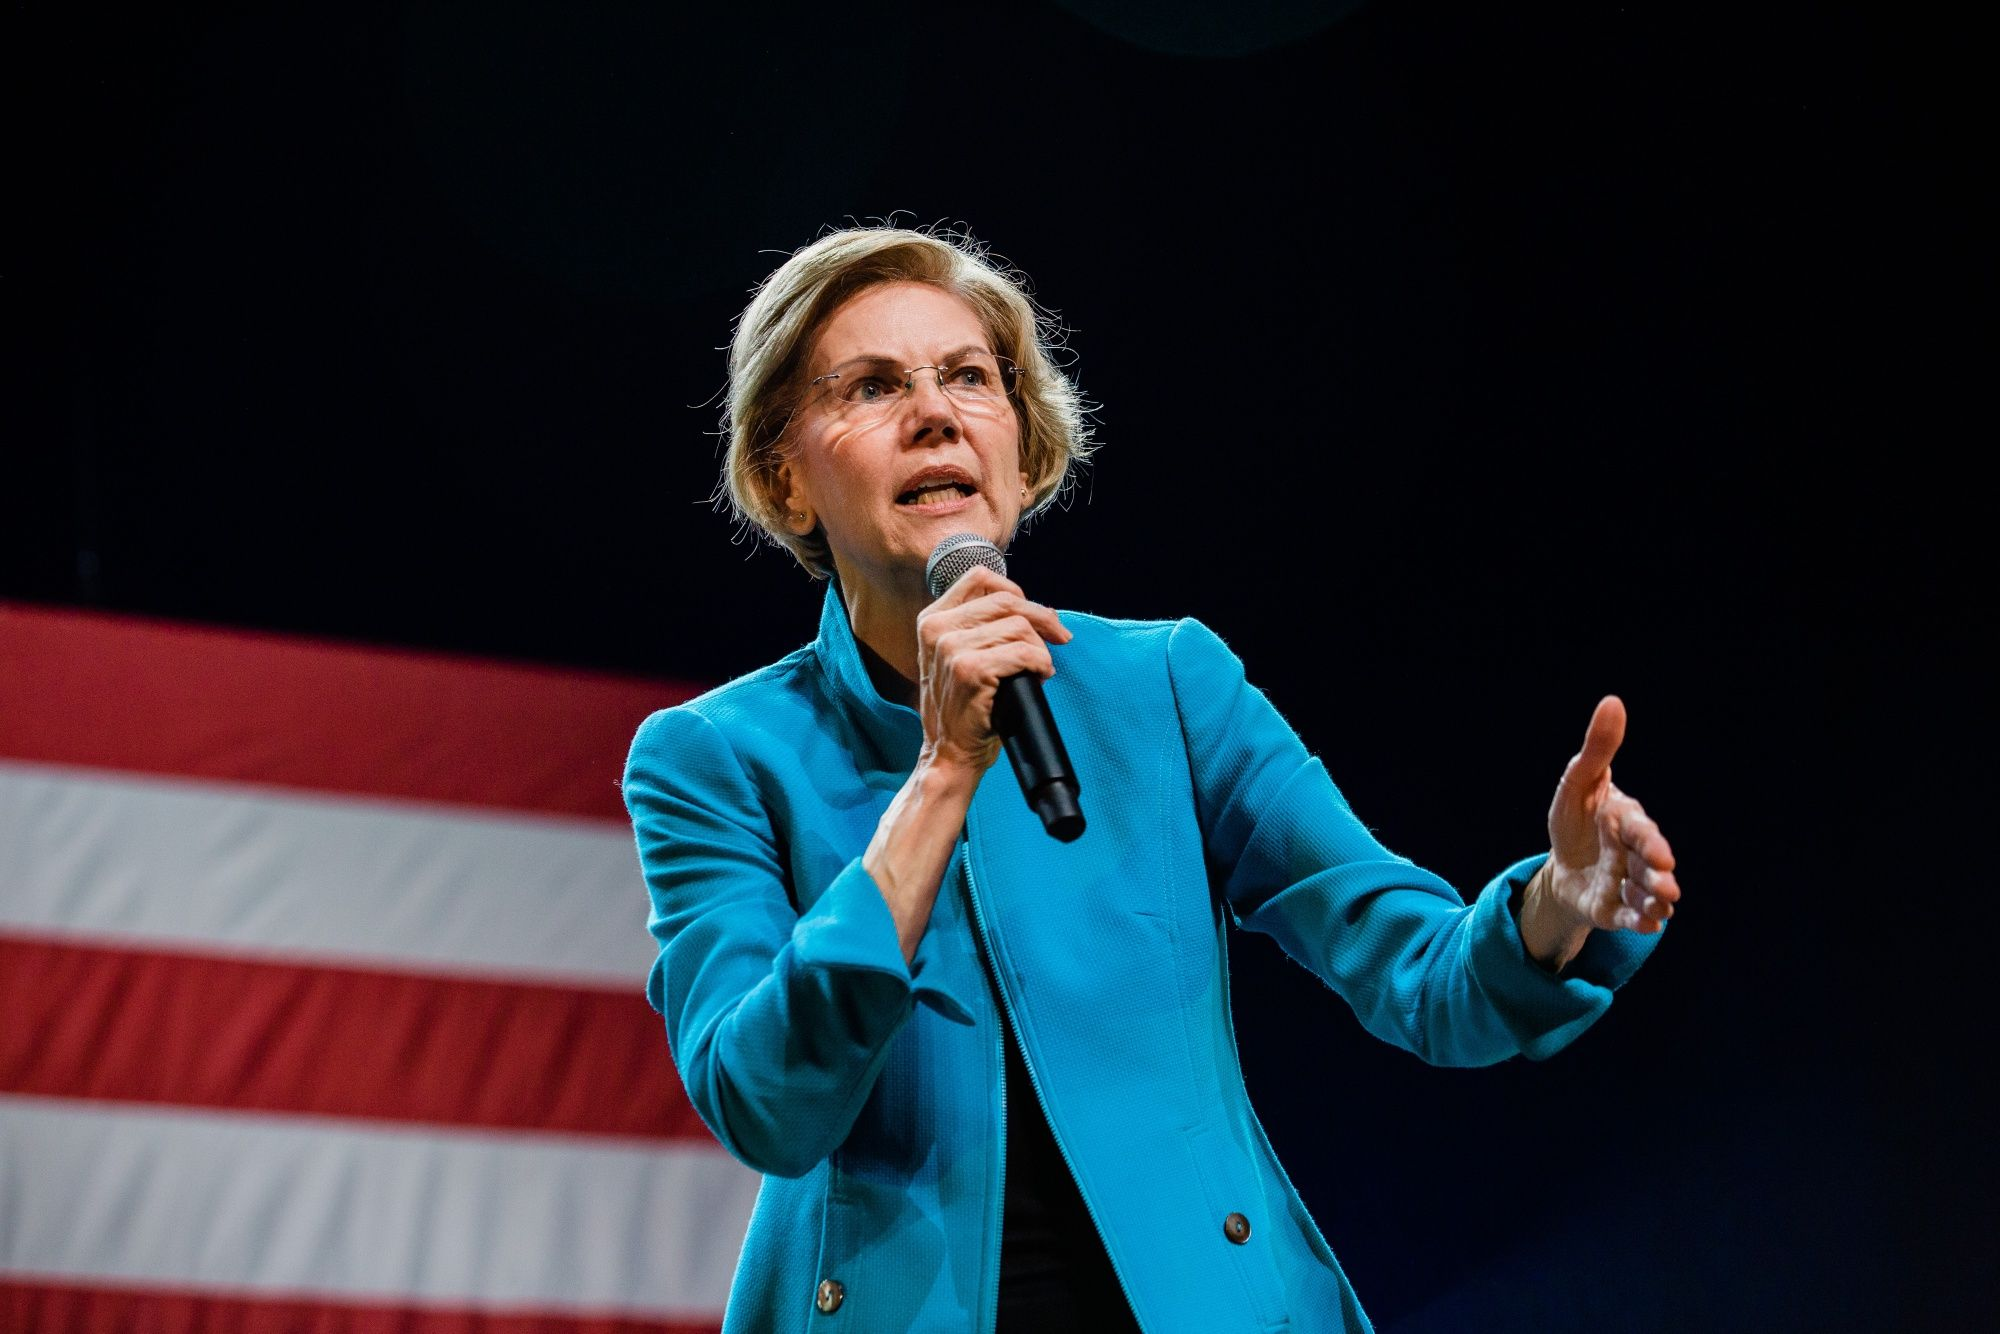 Warren, Klobuchar Get Dual New York Times Nod: Campaign Update